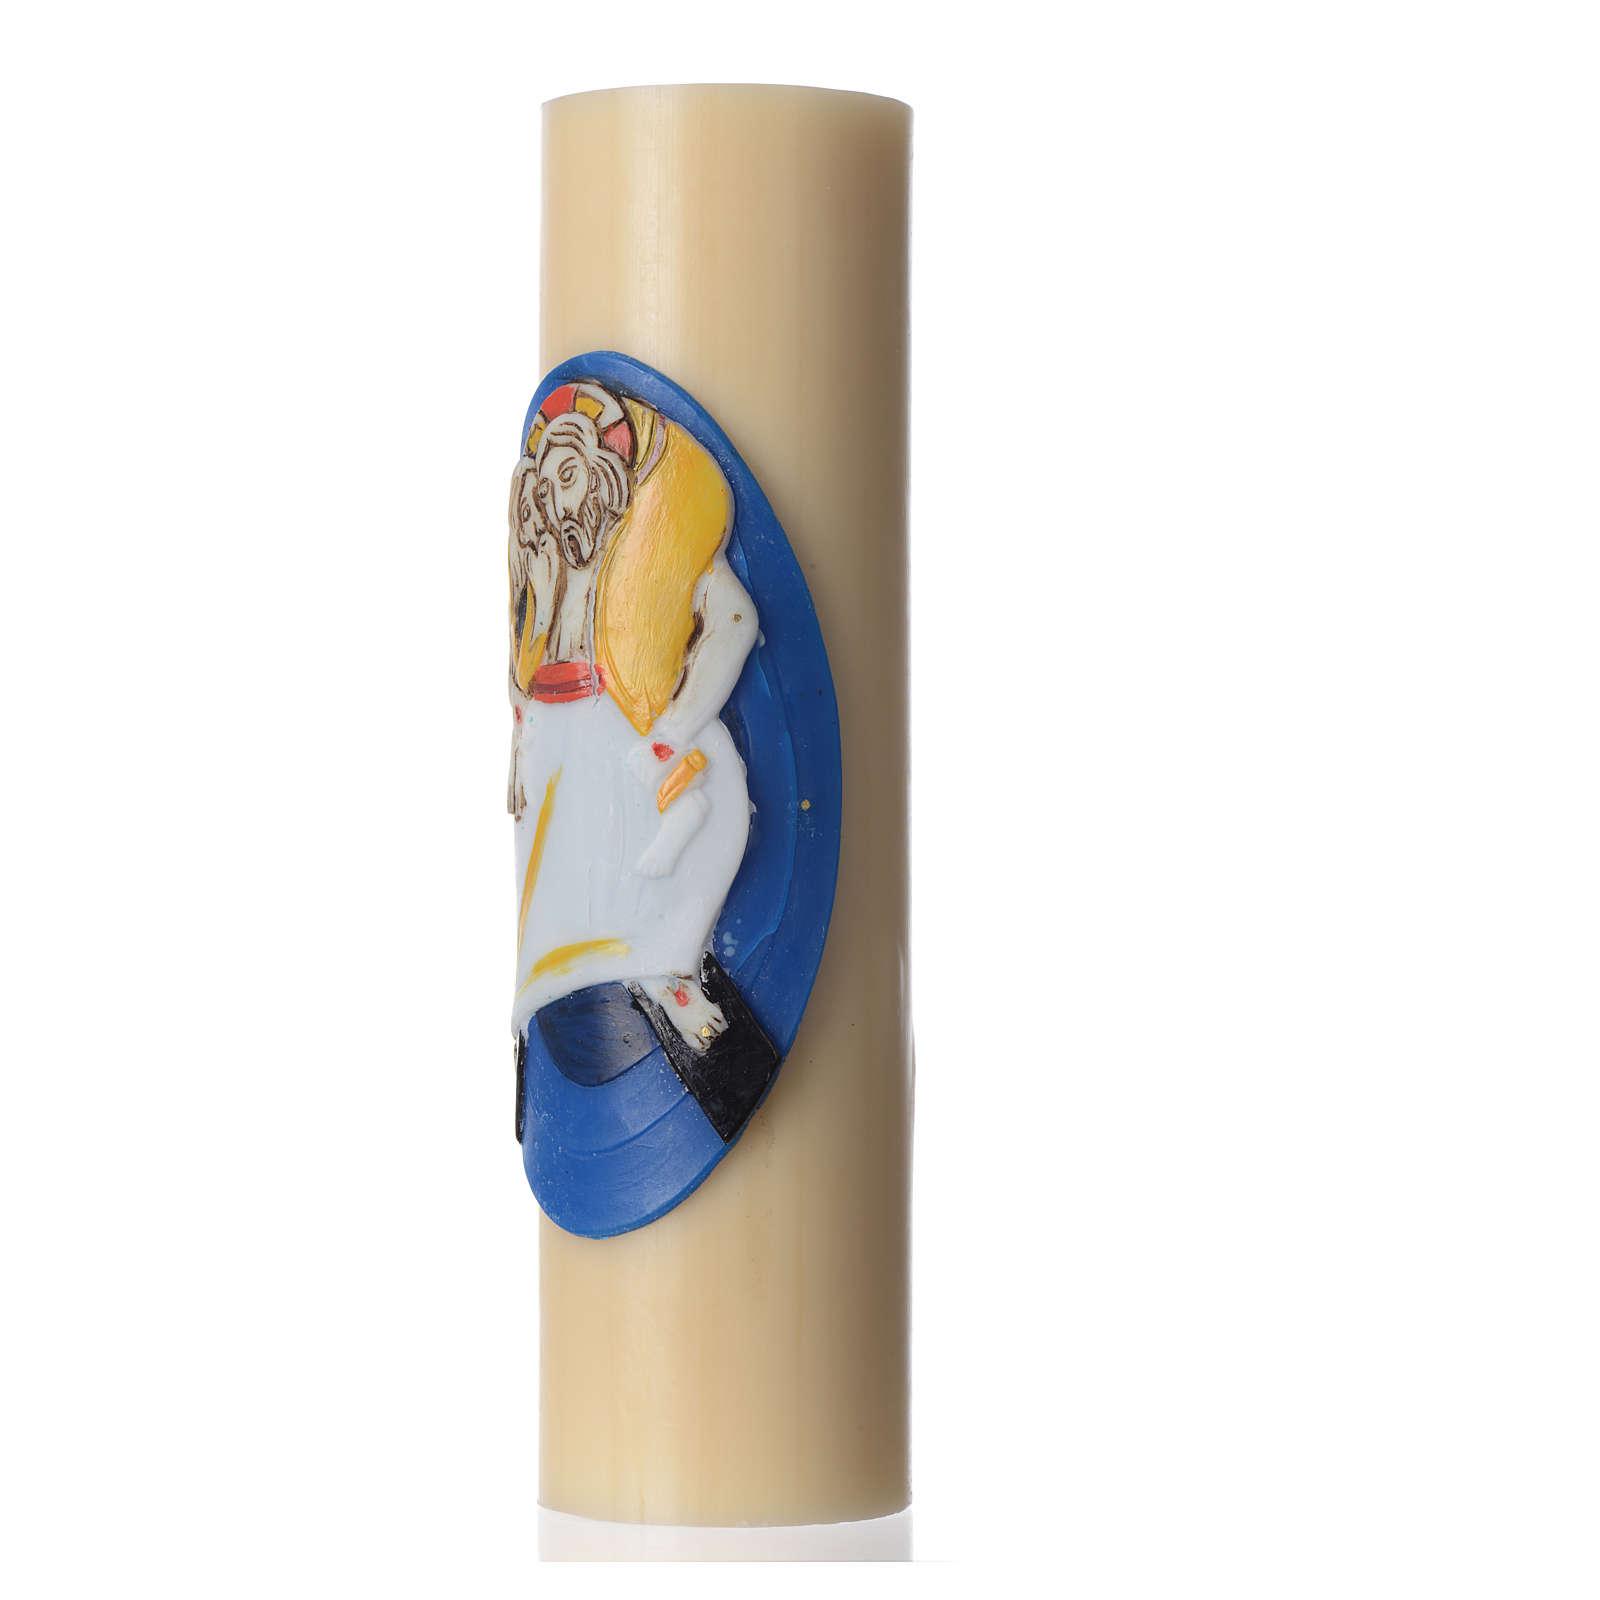 STOCK Vela de Altar Logo Jubileo de la Misericordia, cera de abeja, diám 8 cm 3